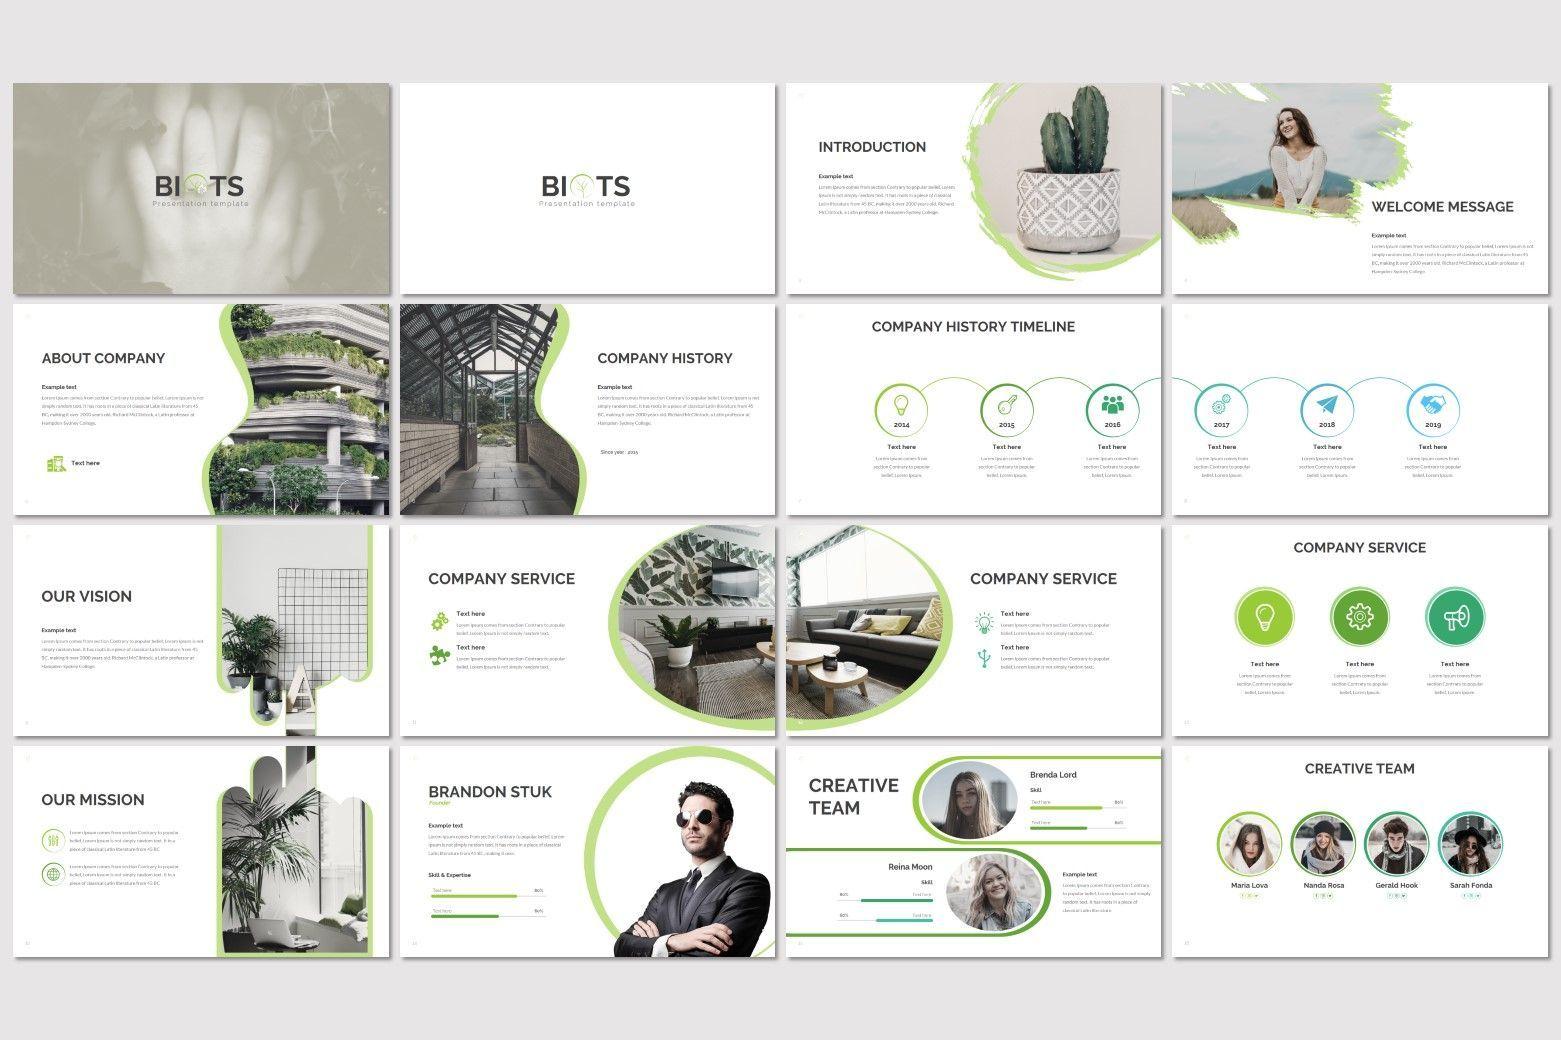 Biots - PowerPoint Template, Slide 2, 07302, Presentation Templates — PoweredTemplate.com